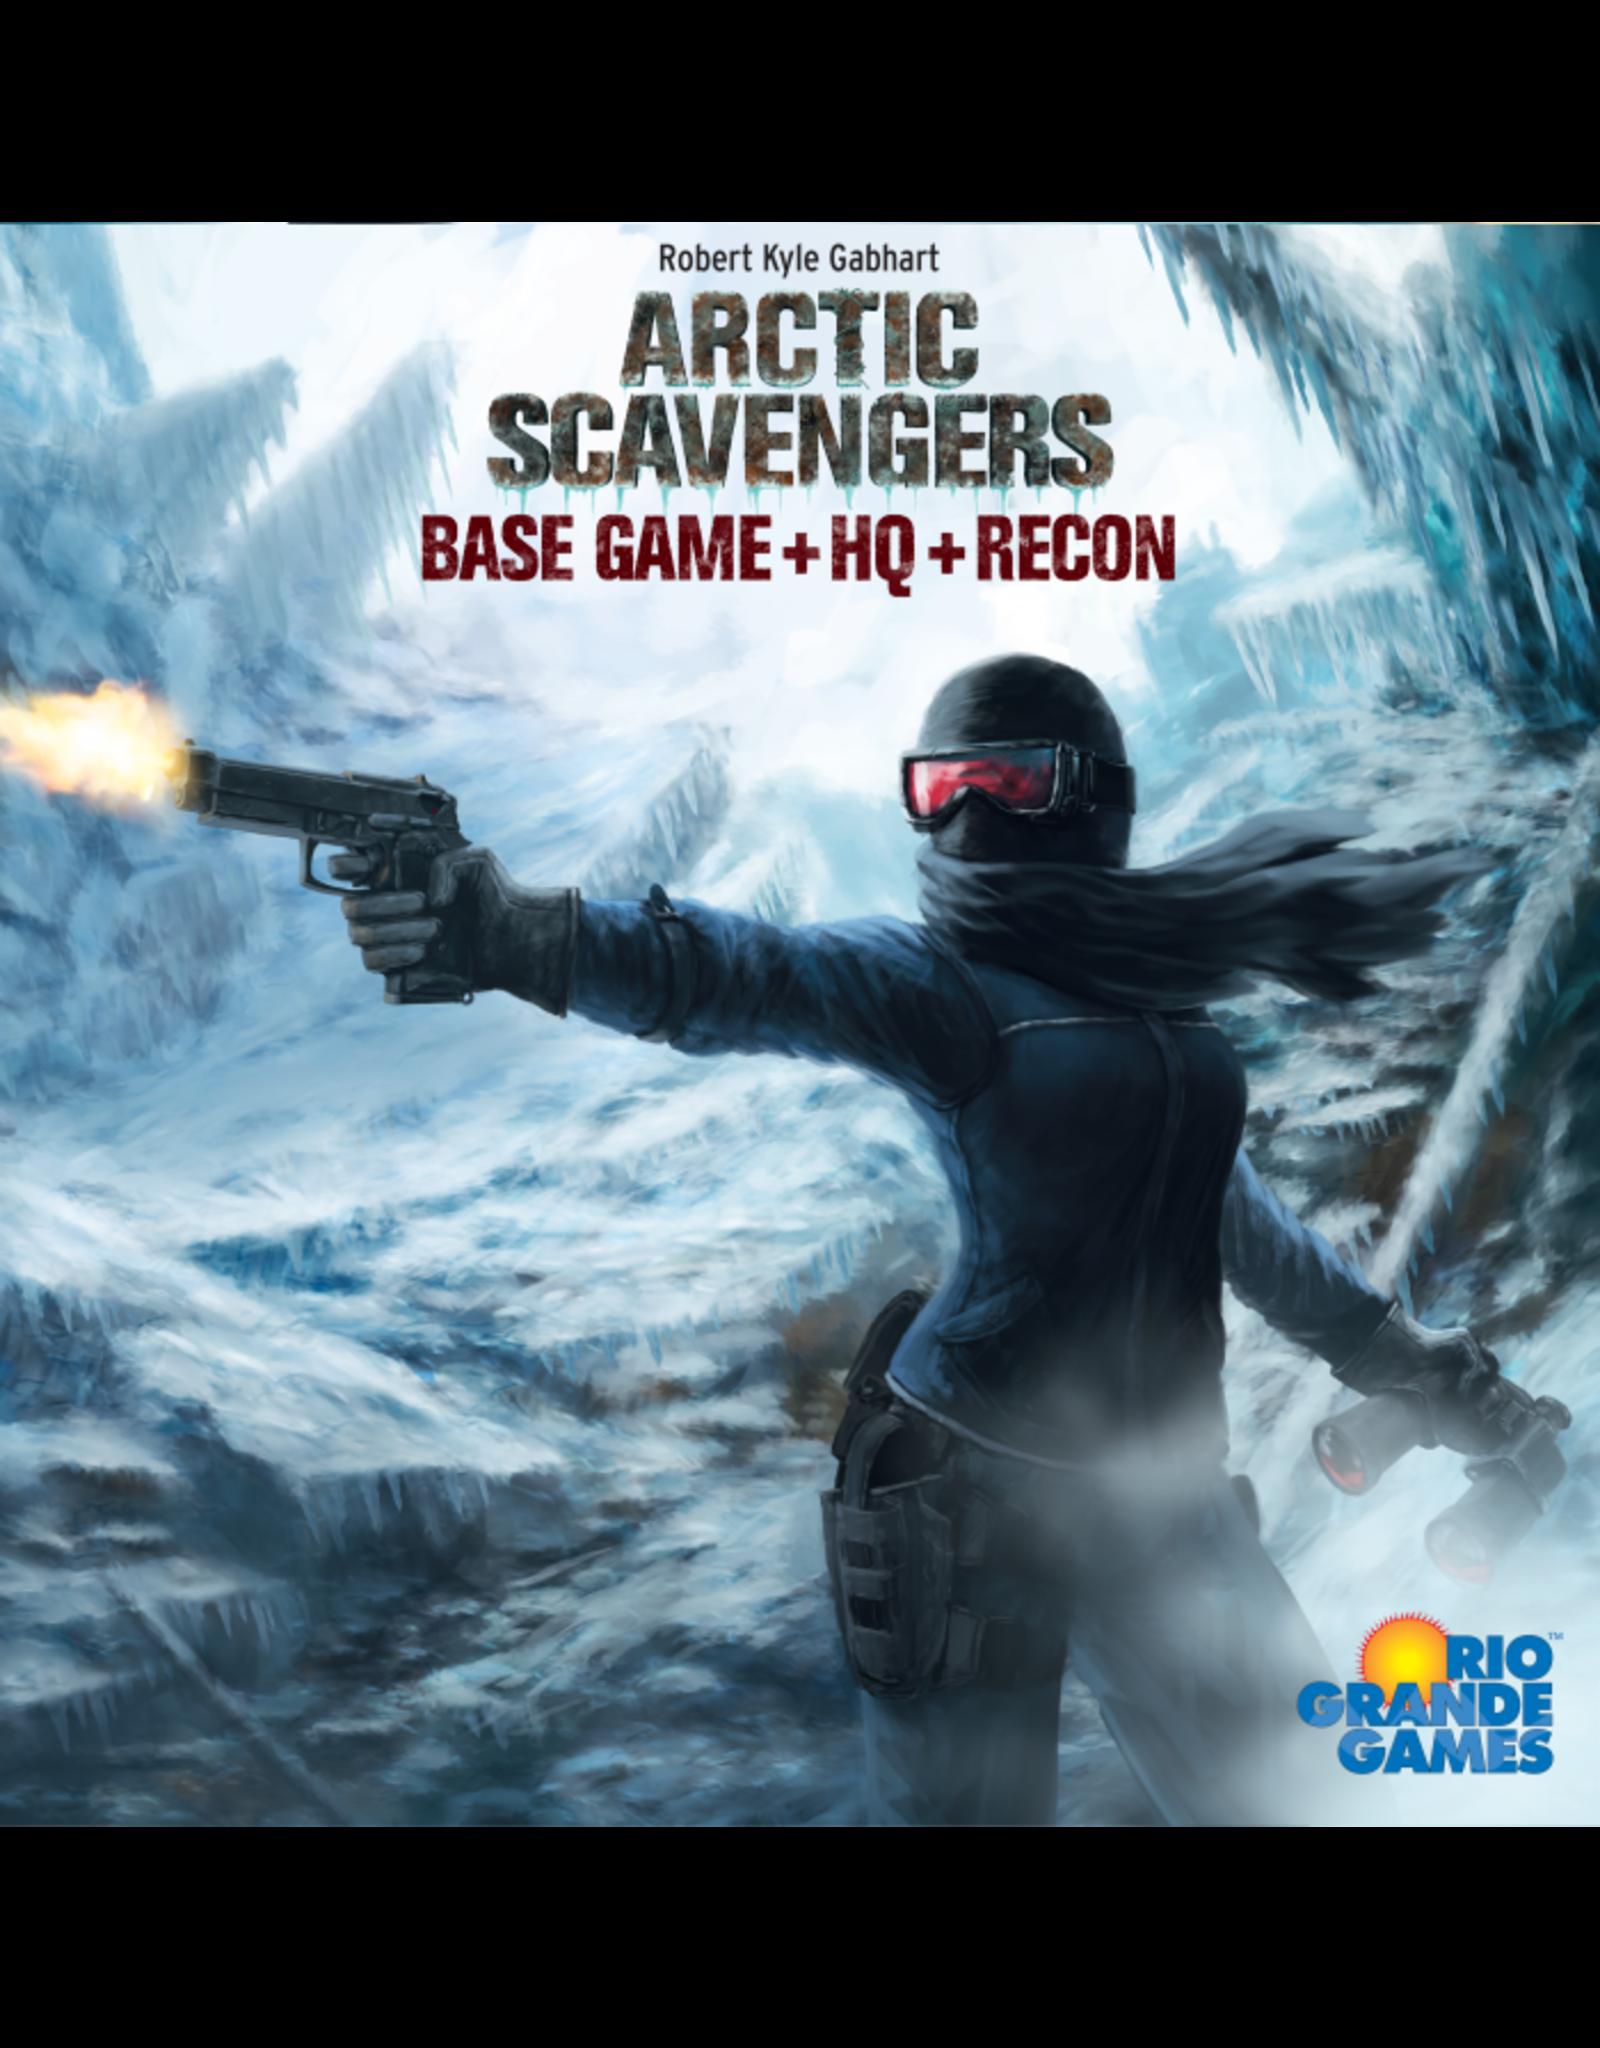 Arctic Scavengers: Base Game + HQ + Recon